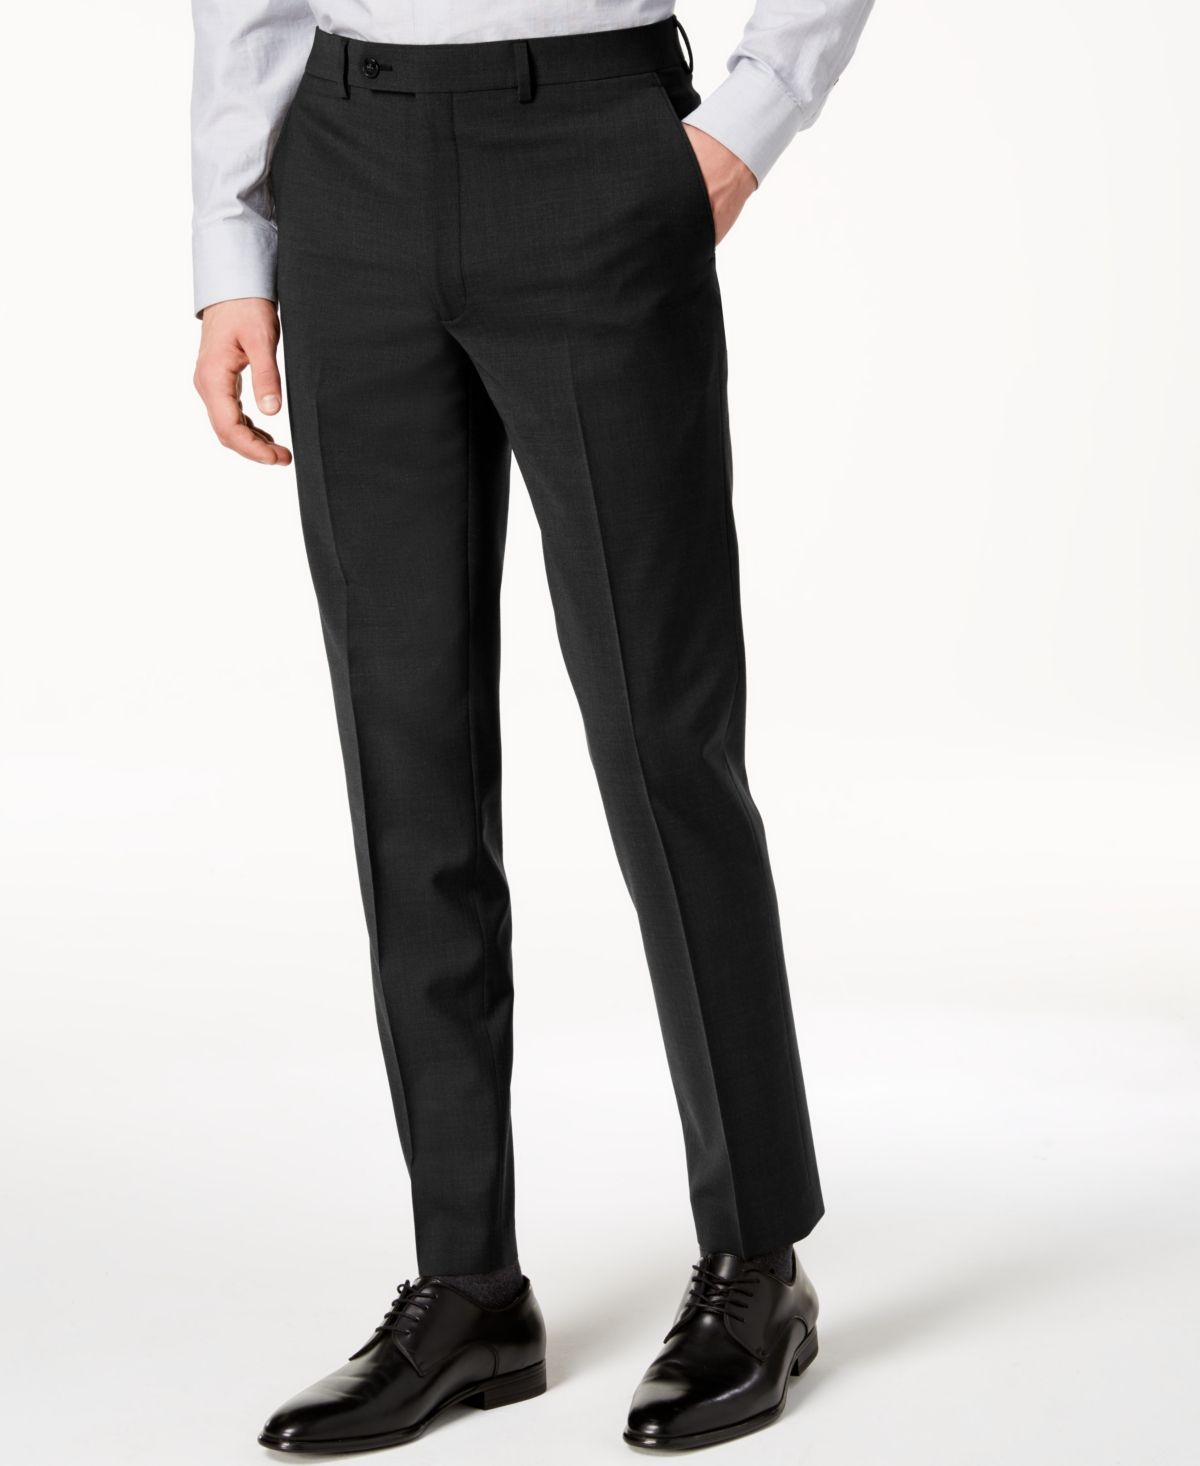 Calvin Klein Men S Skinny Fit Extra Slim Infinite Stretch Suit Pants Reviews Pants Men Macy S Slim Fit Dress Pants Pantsuit Calvin Klein Men [ 1466 x 1200 Pixel ]